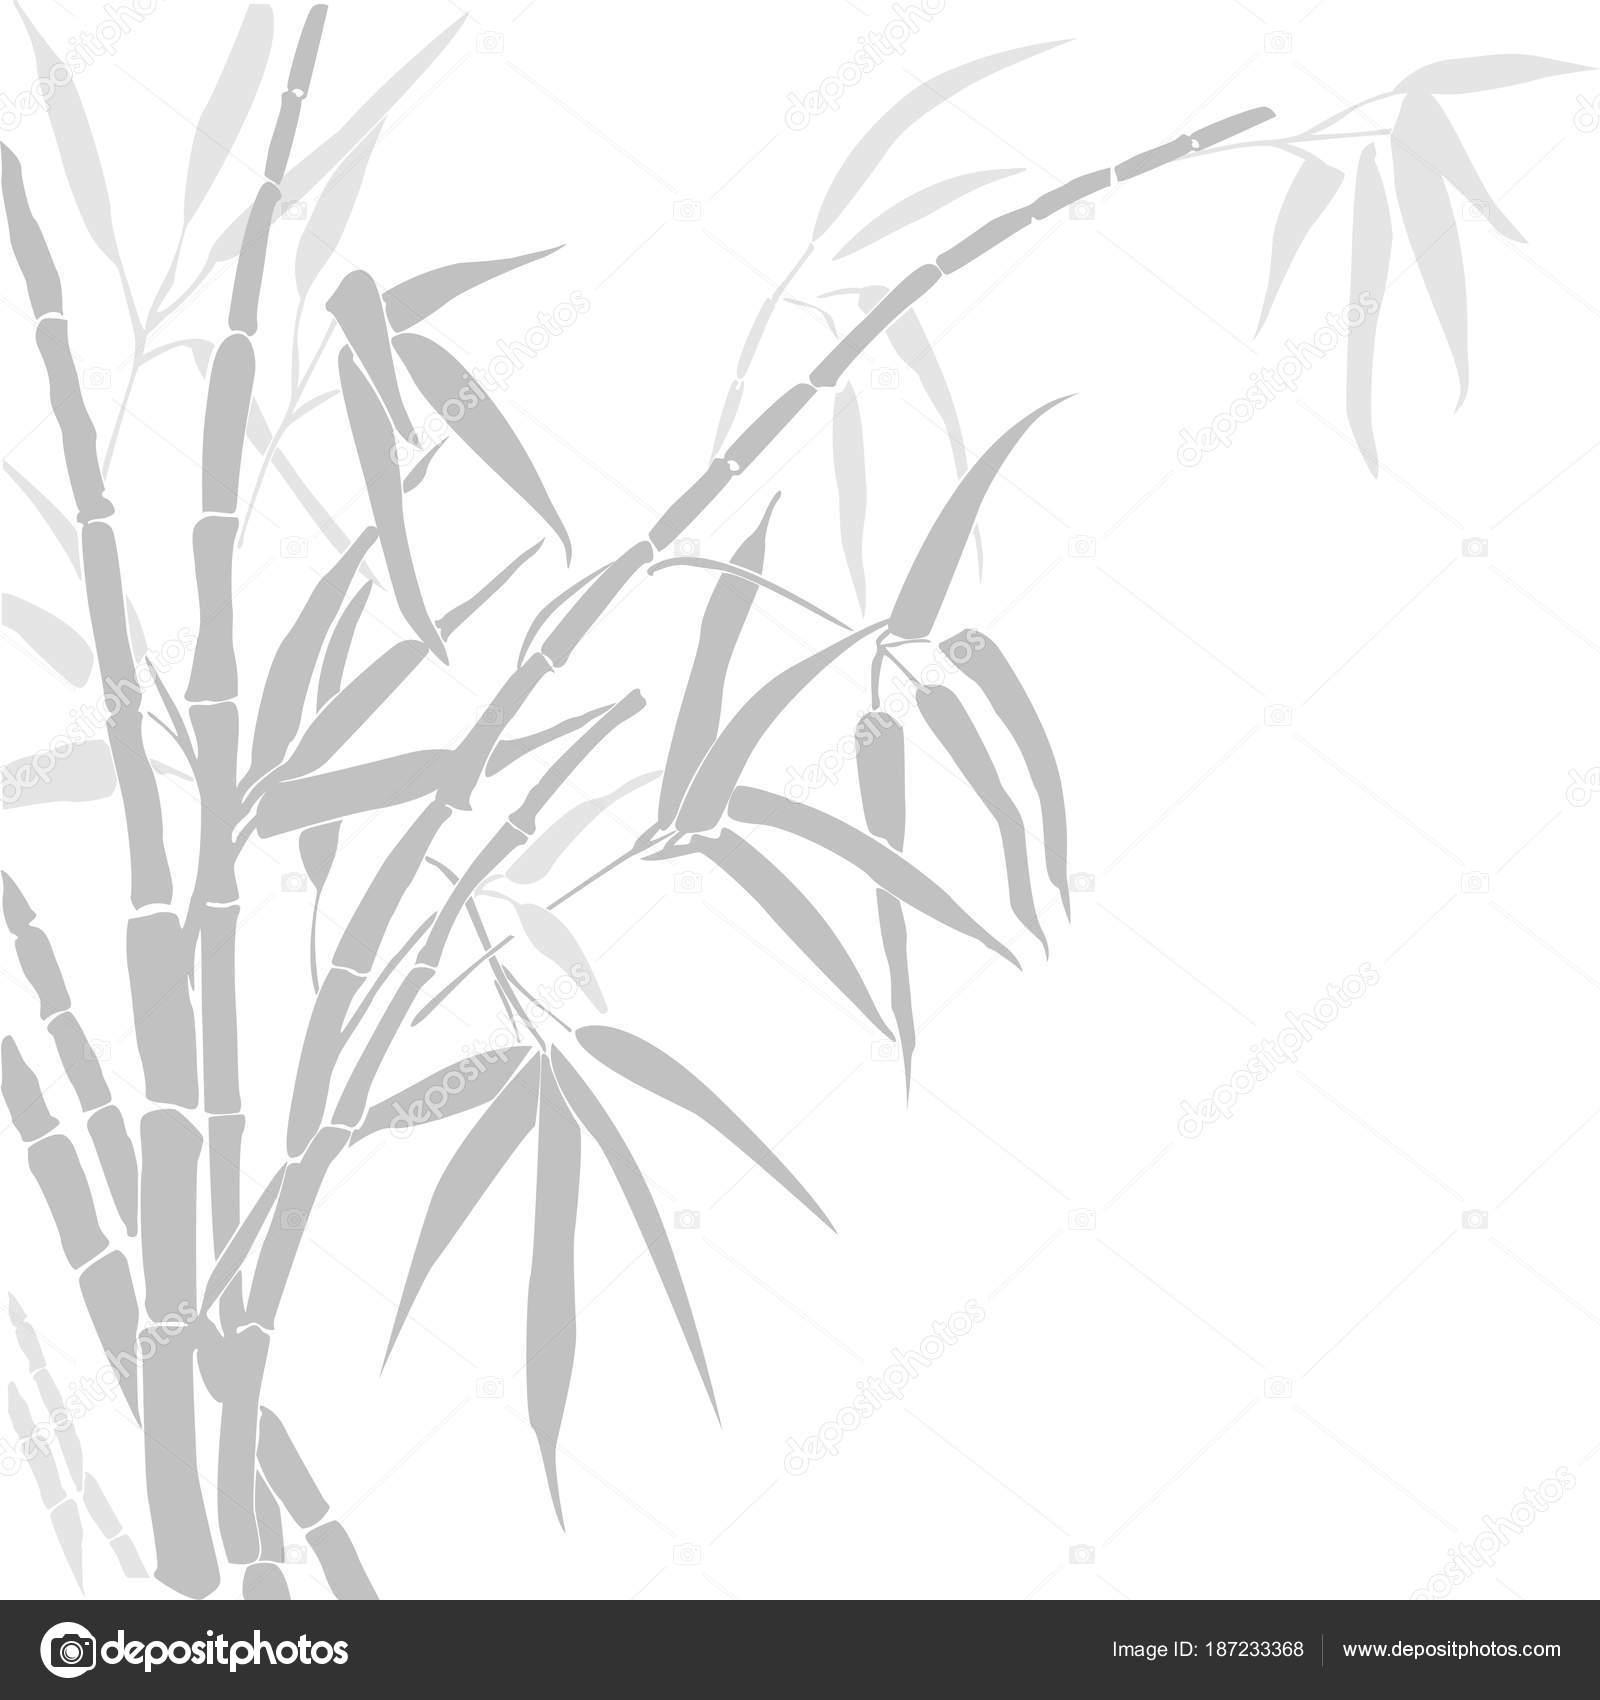 bamboo vector silhouette bamboo silhouette bamboo gray colors isolated white stock vector c avto mkcentr yandex ru 187233368 https depositphotos com 187233368 stock illustration bamboo vector silhouette bamboo silhouette html